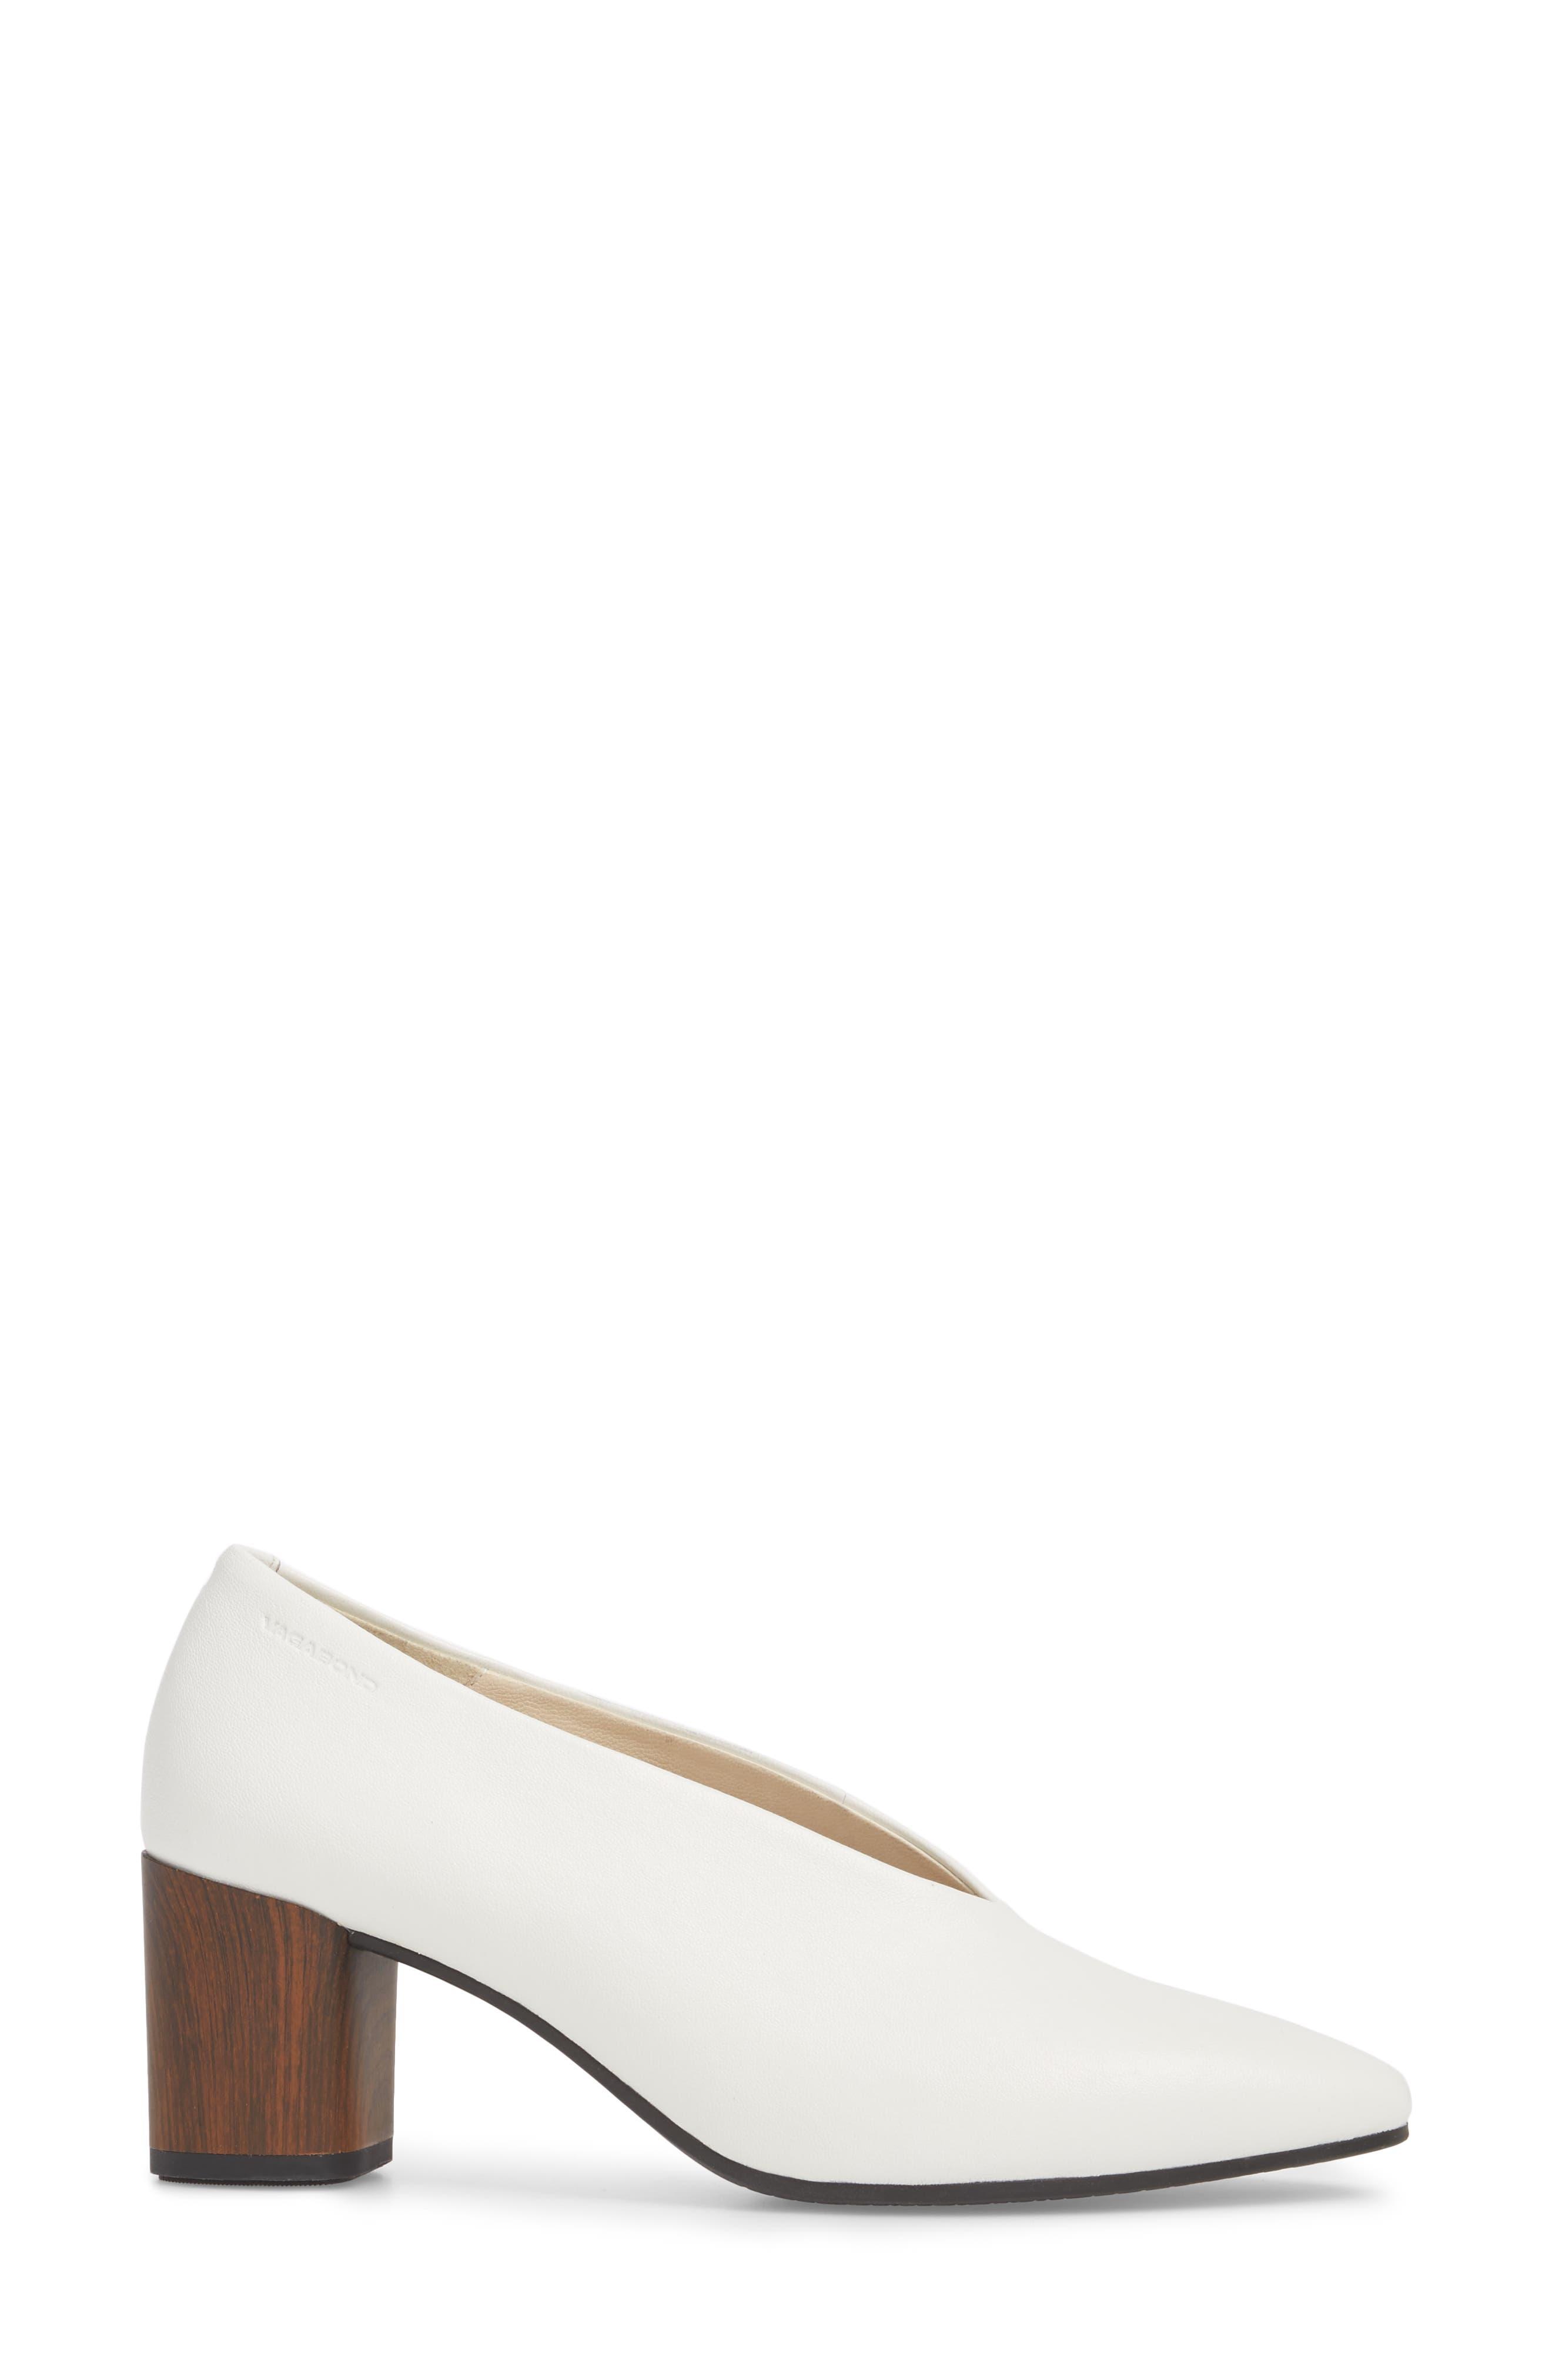 Eve Pump,                             Alternate thumbnail 3, color,                             Cream White Leather